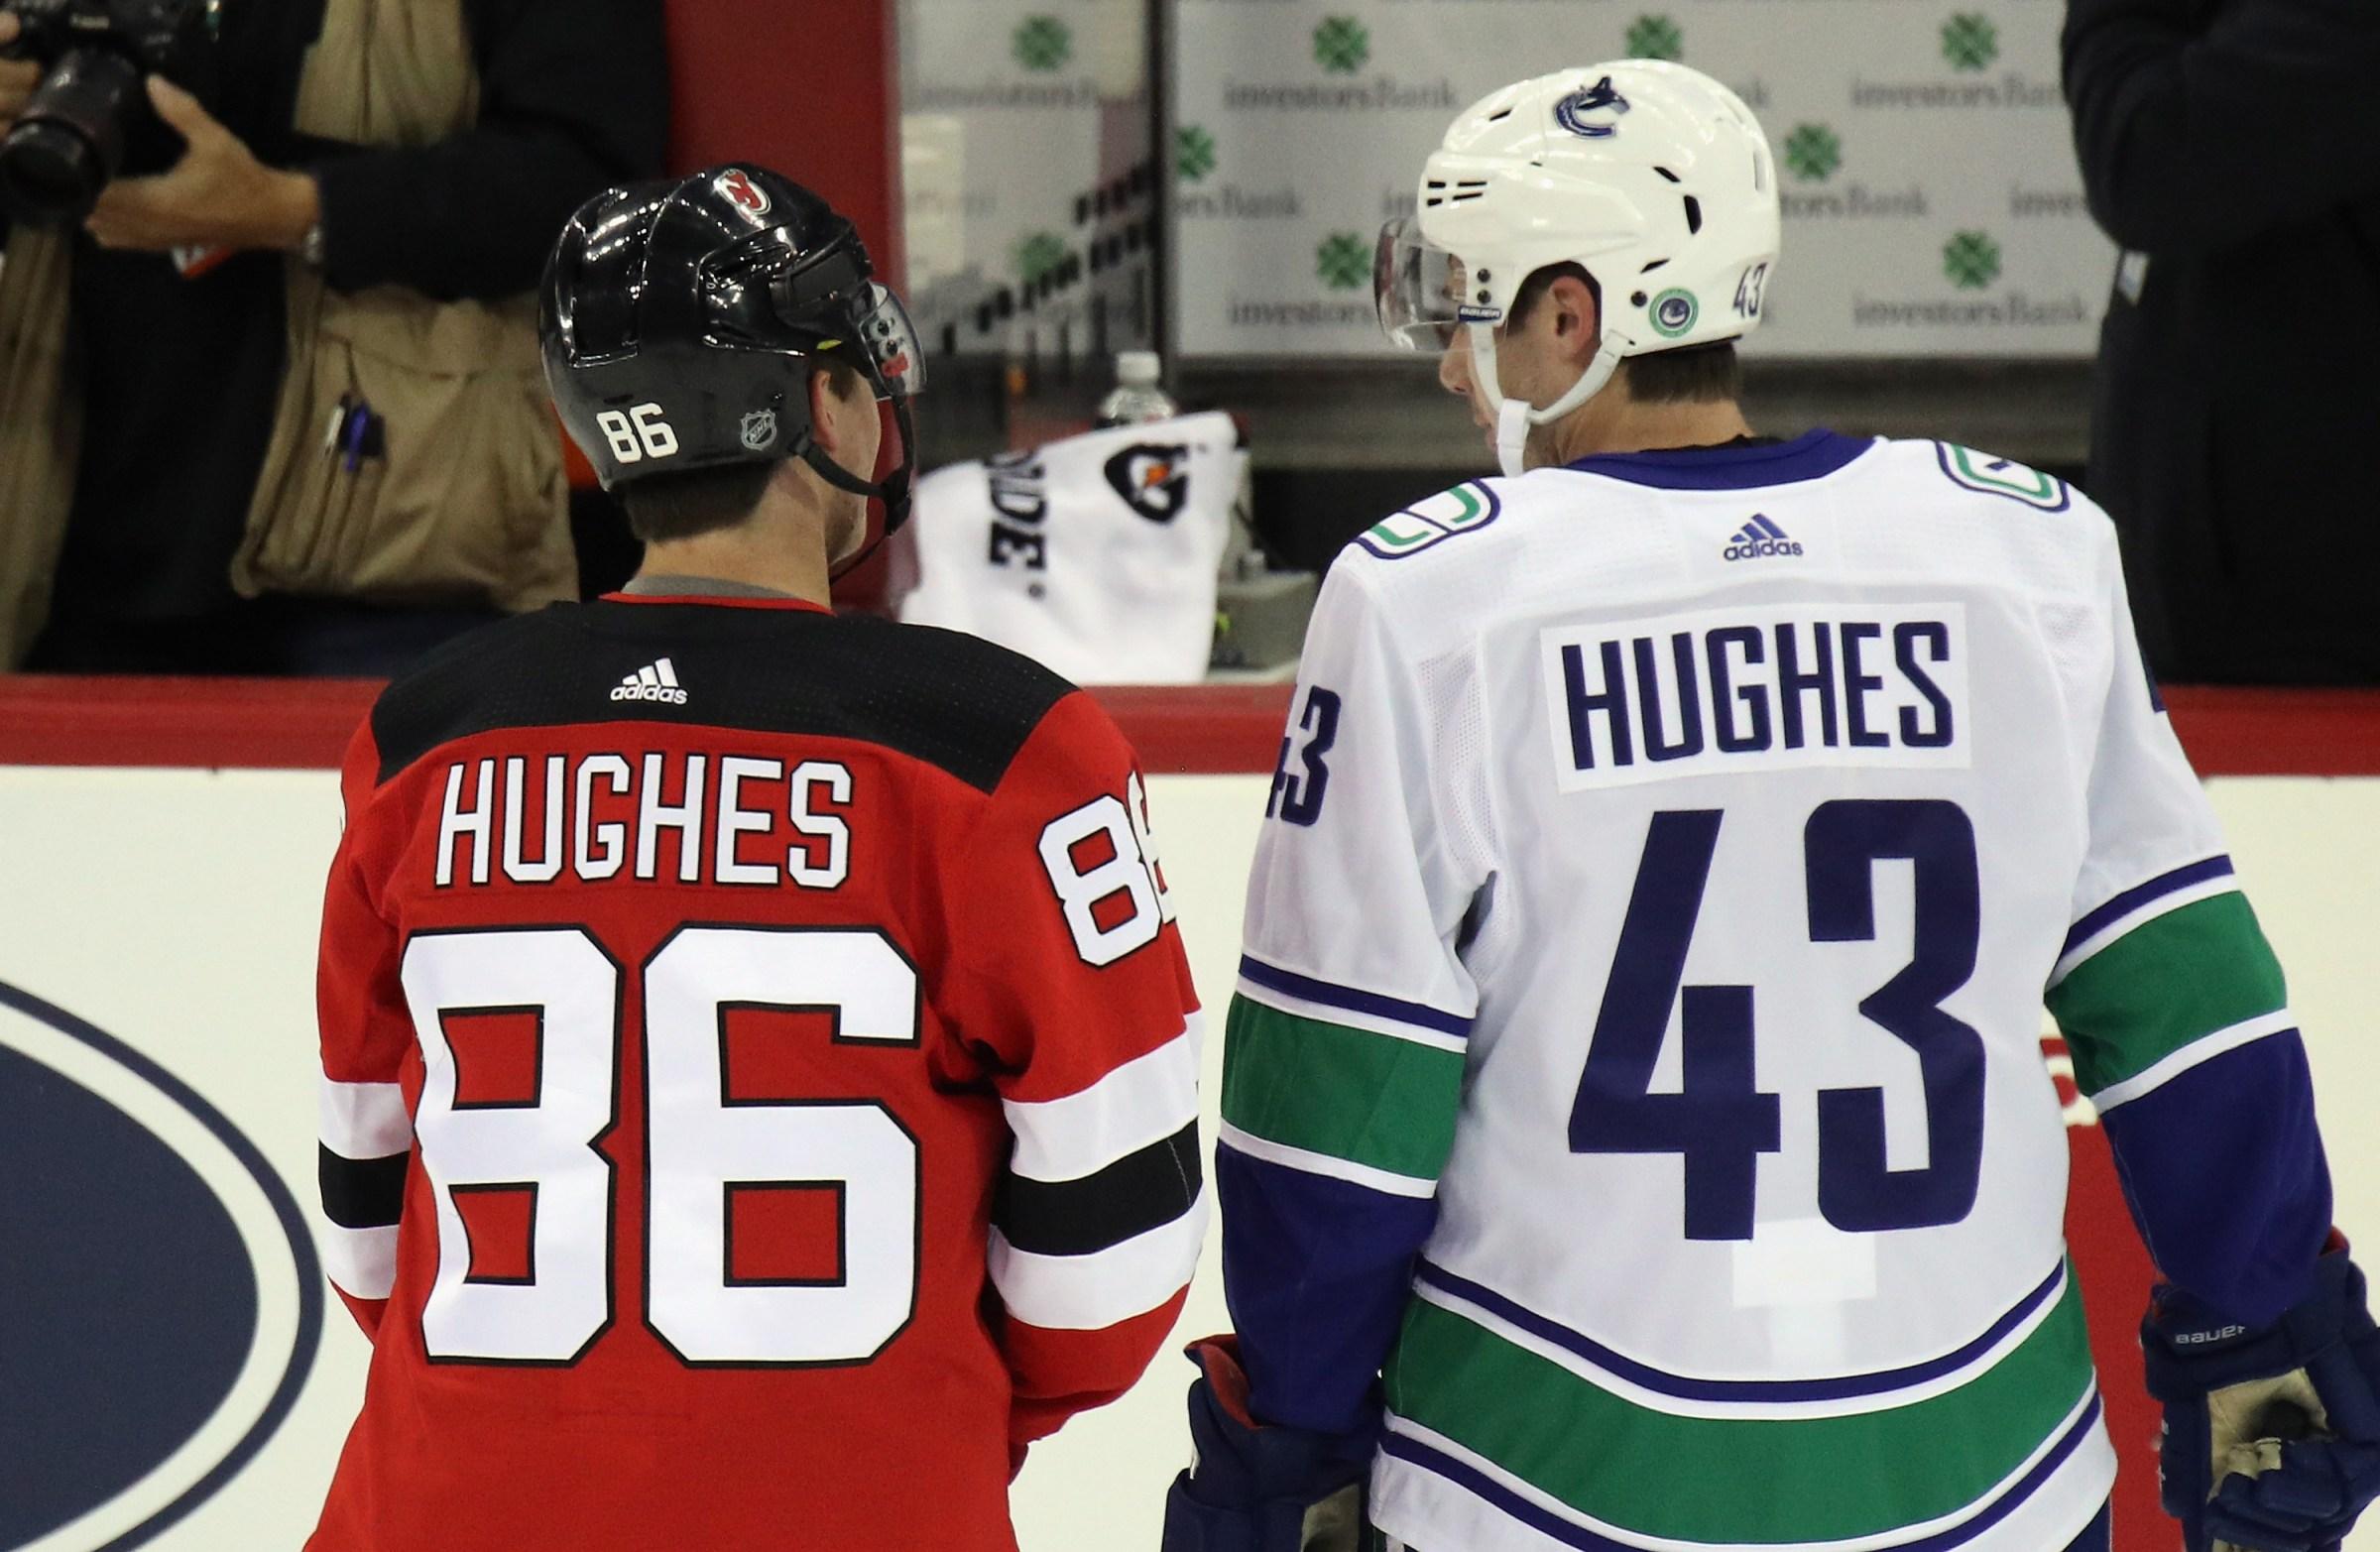 Jack Hughes and Quinn Hughes skate in warm-ups